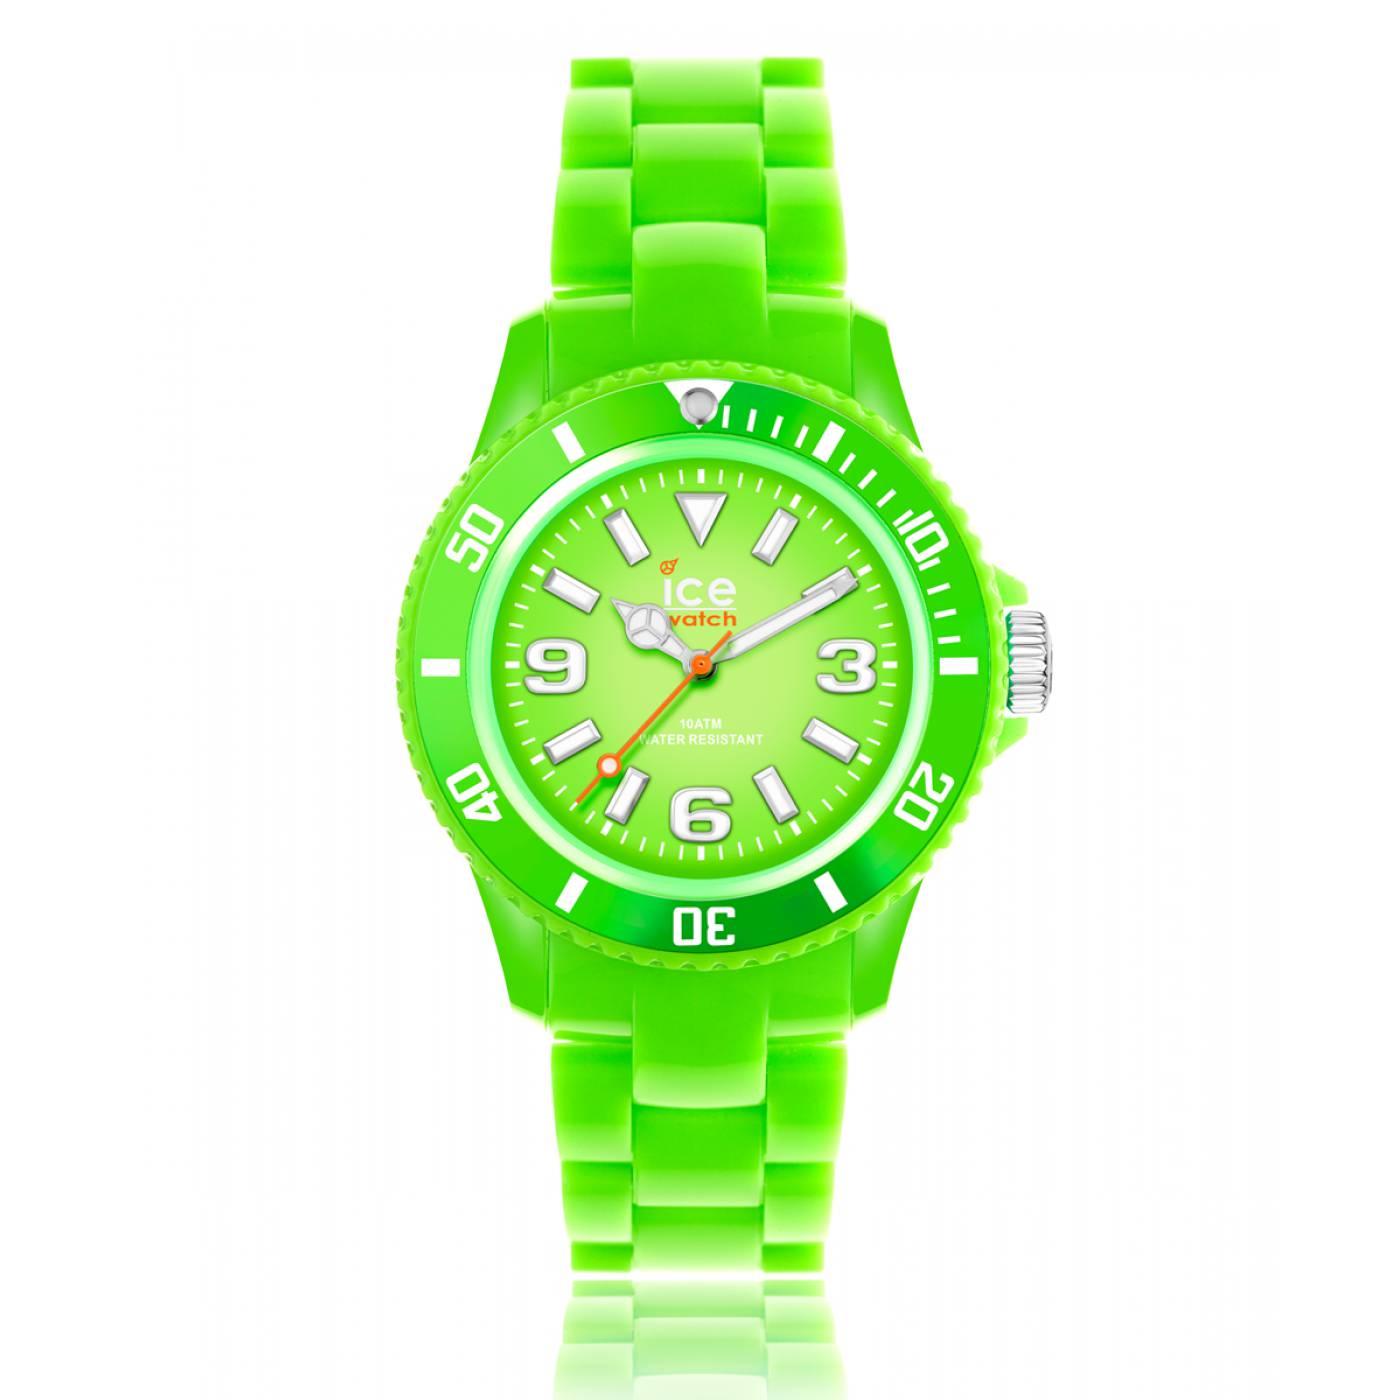 montre imitation ice watch